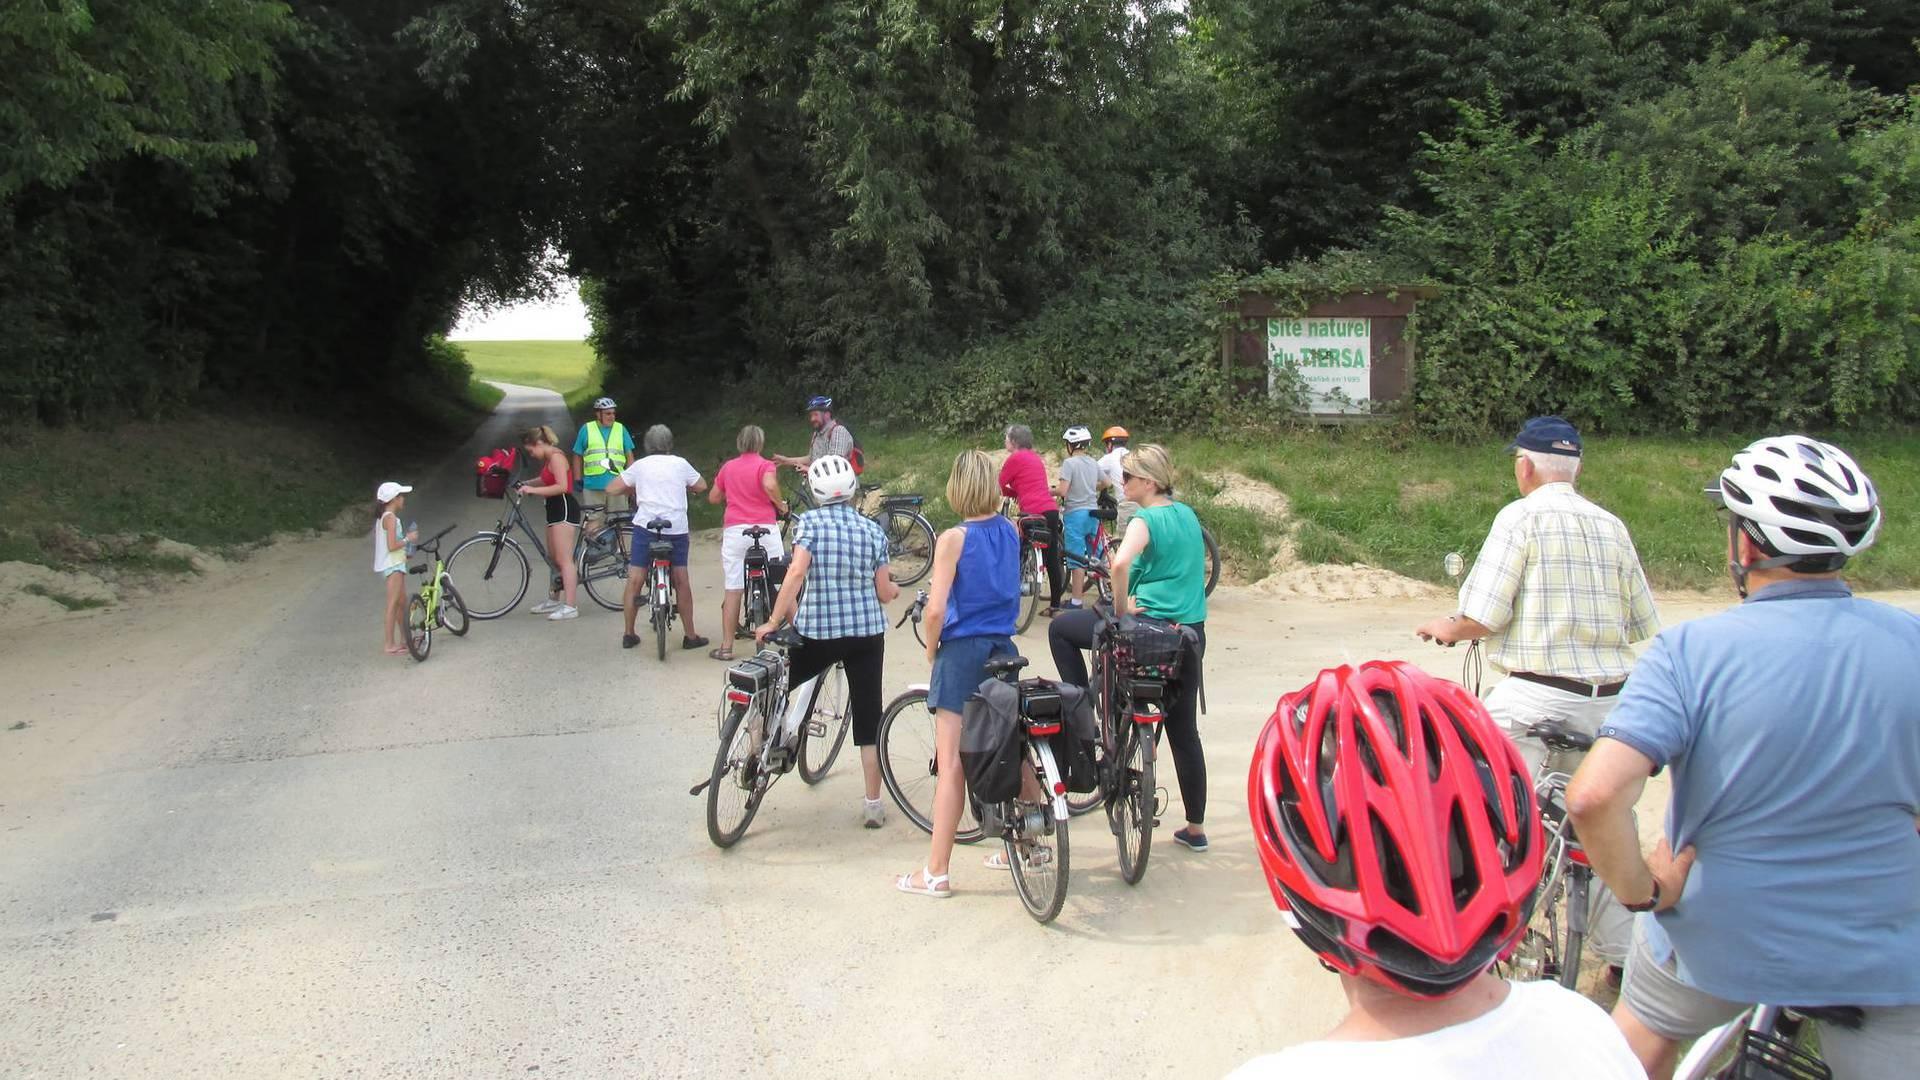 Vélexploreurs